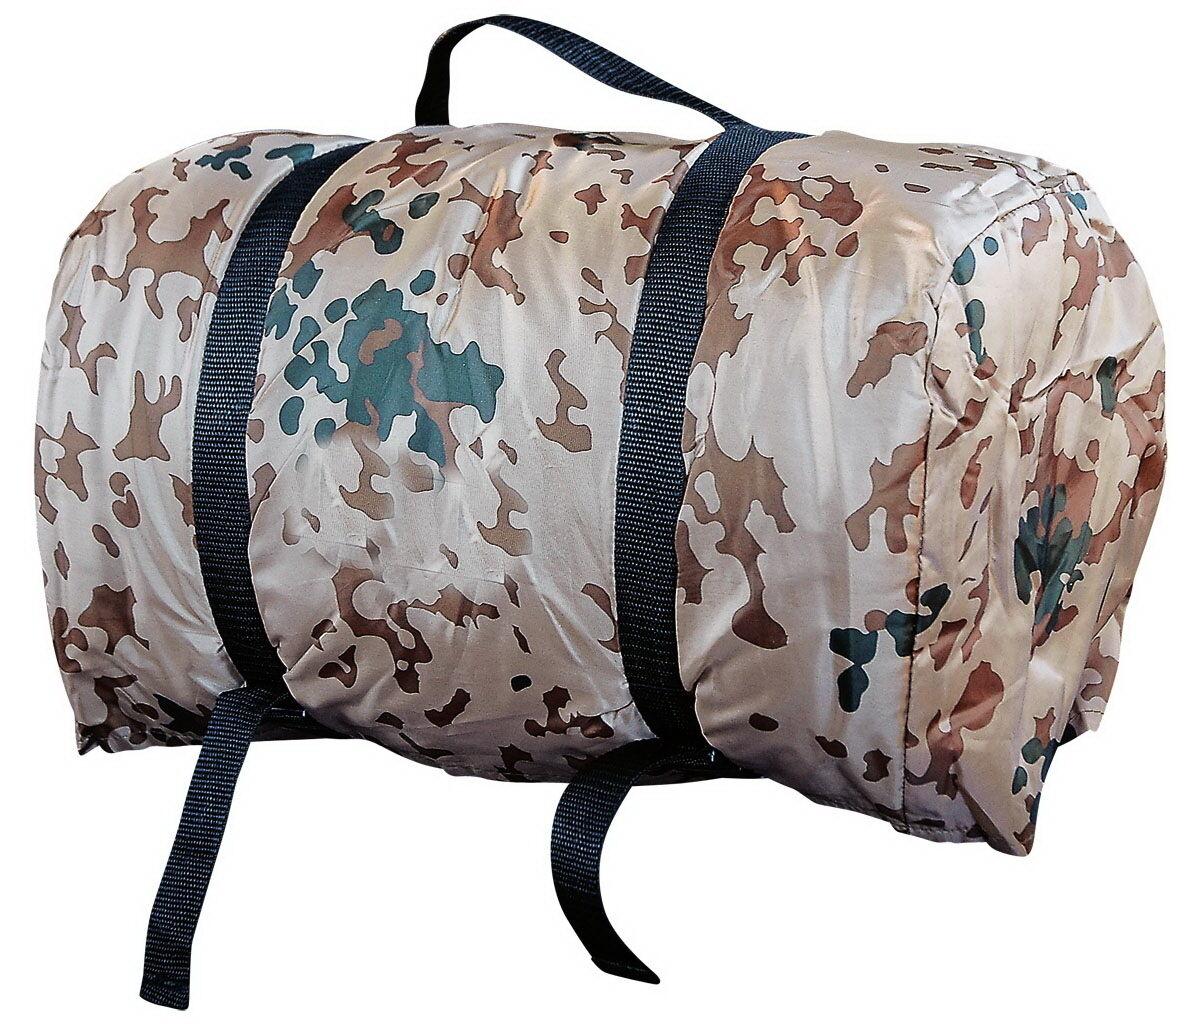 Army Pilots Sleeping Bag BW Bundeswehr Tropical Camouflage US Survival Safari